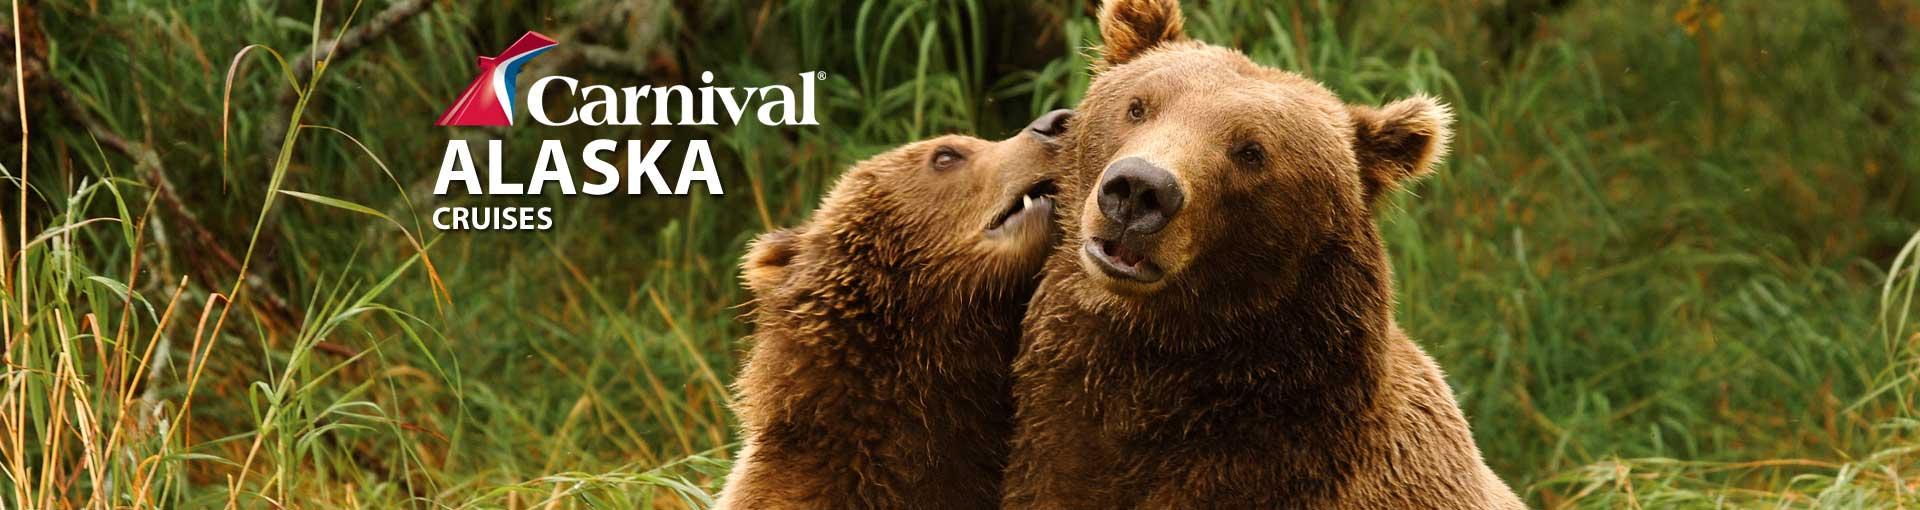 Carnival Cruise Lines Alaska Cruises